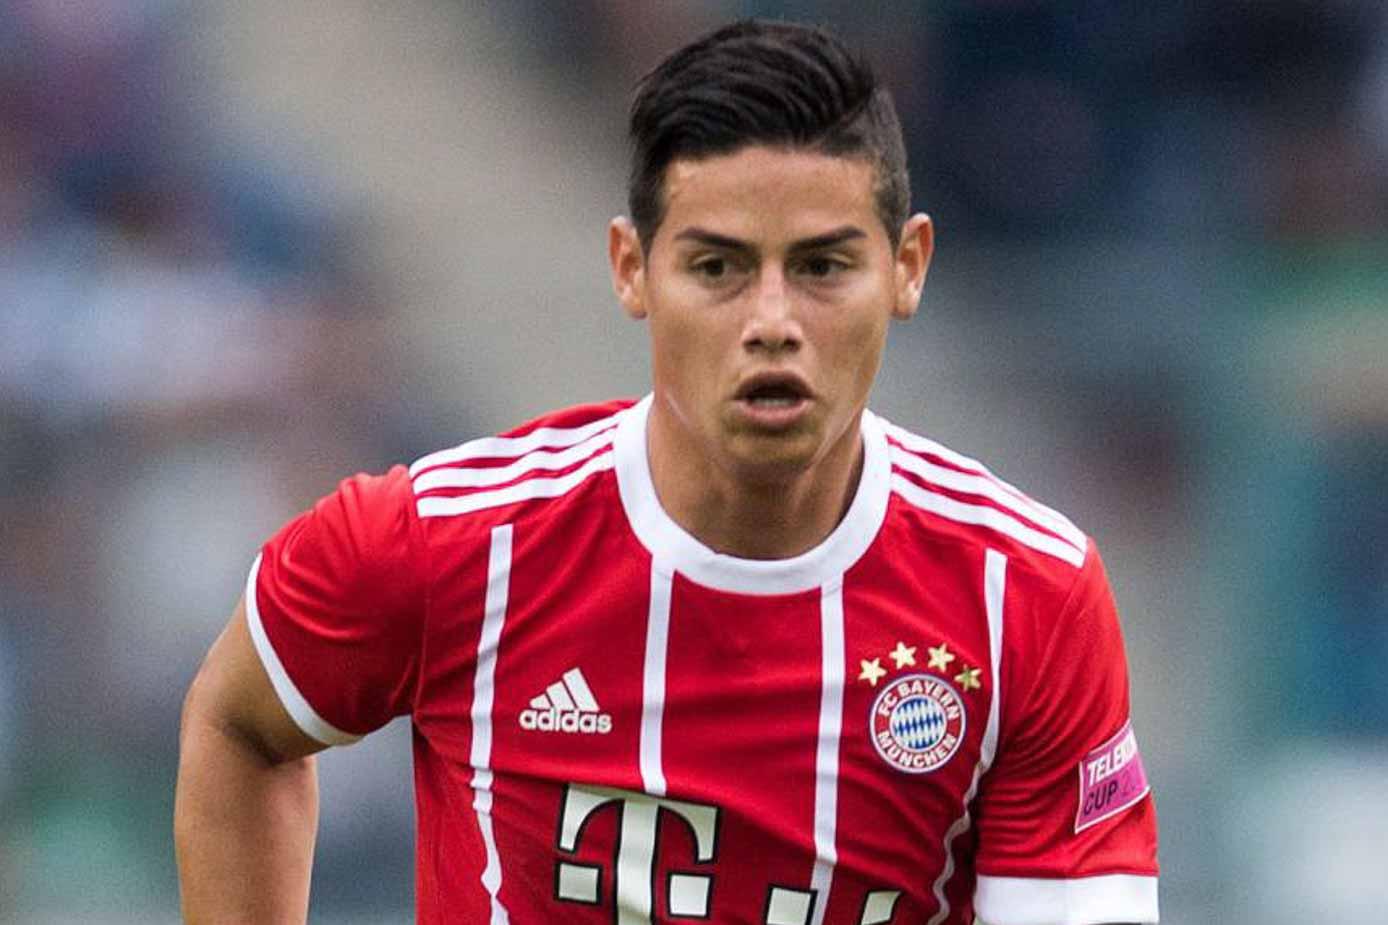 detailed look 16b32 231b2 James Rodriguez Jersey - FC Bayern & Colombia - SoccerPro.com